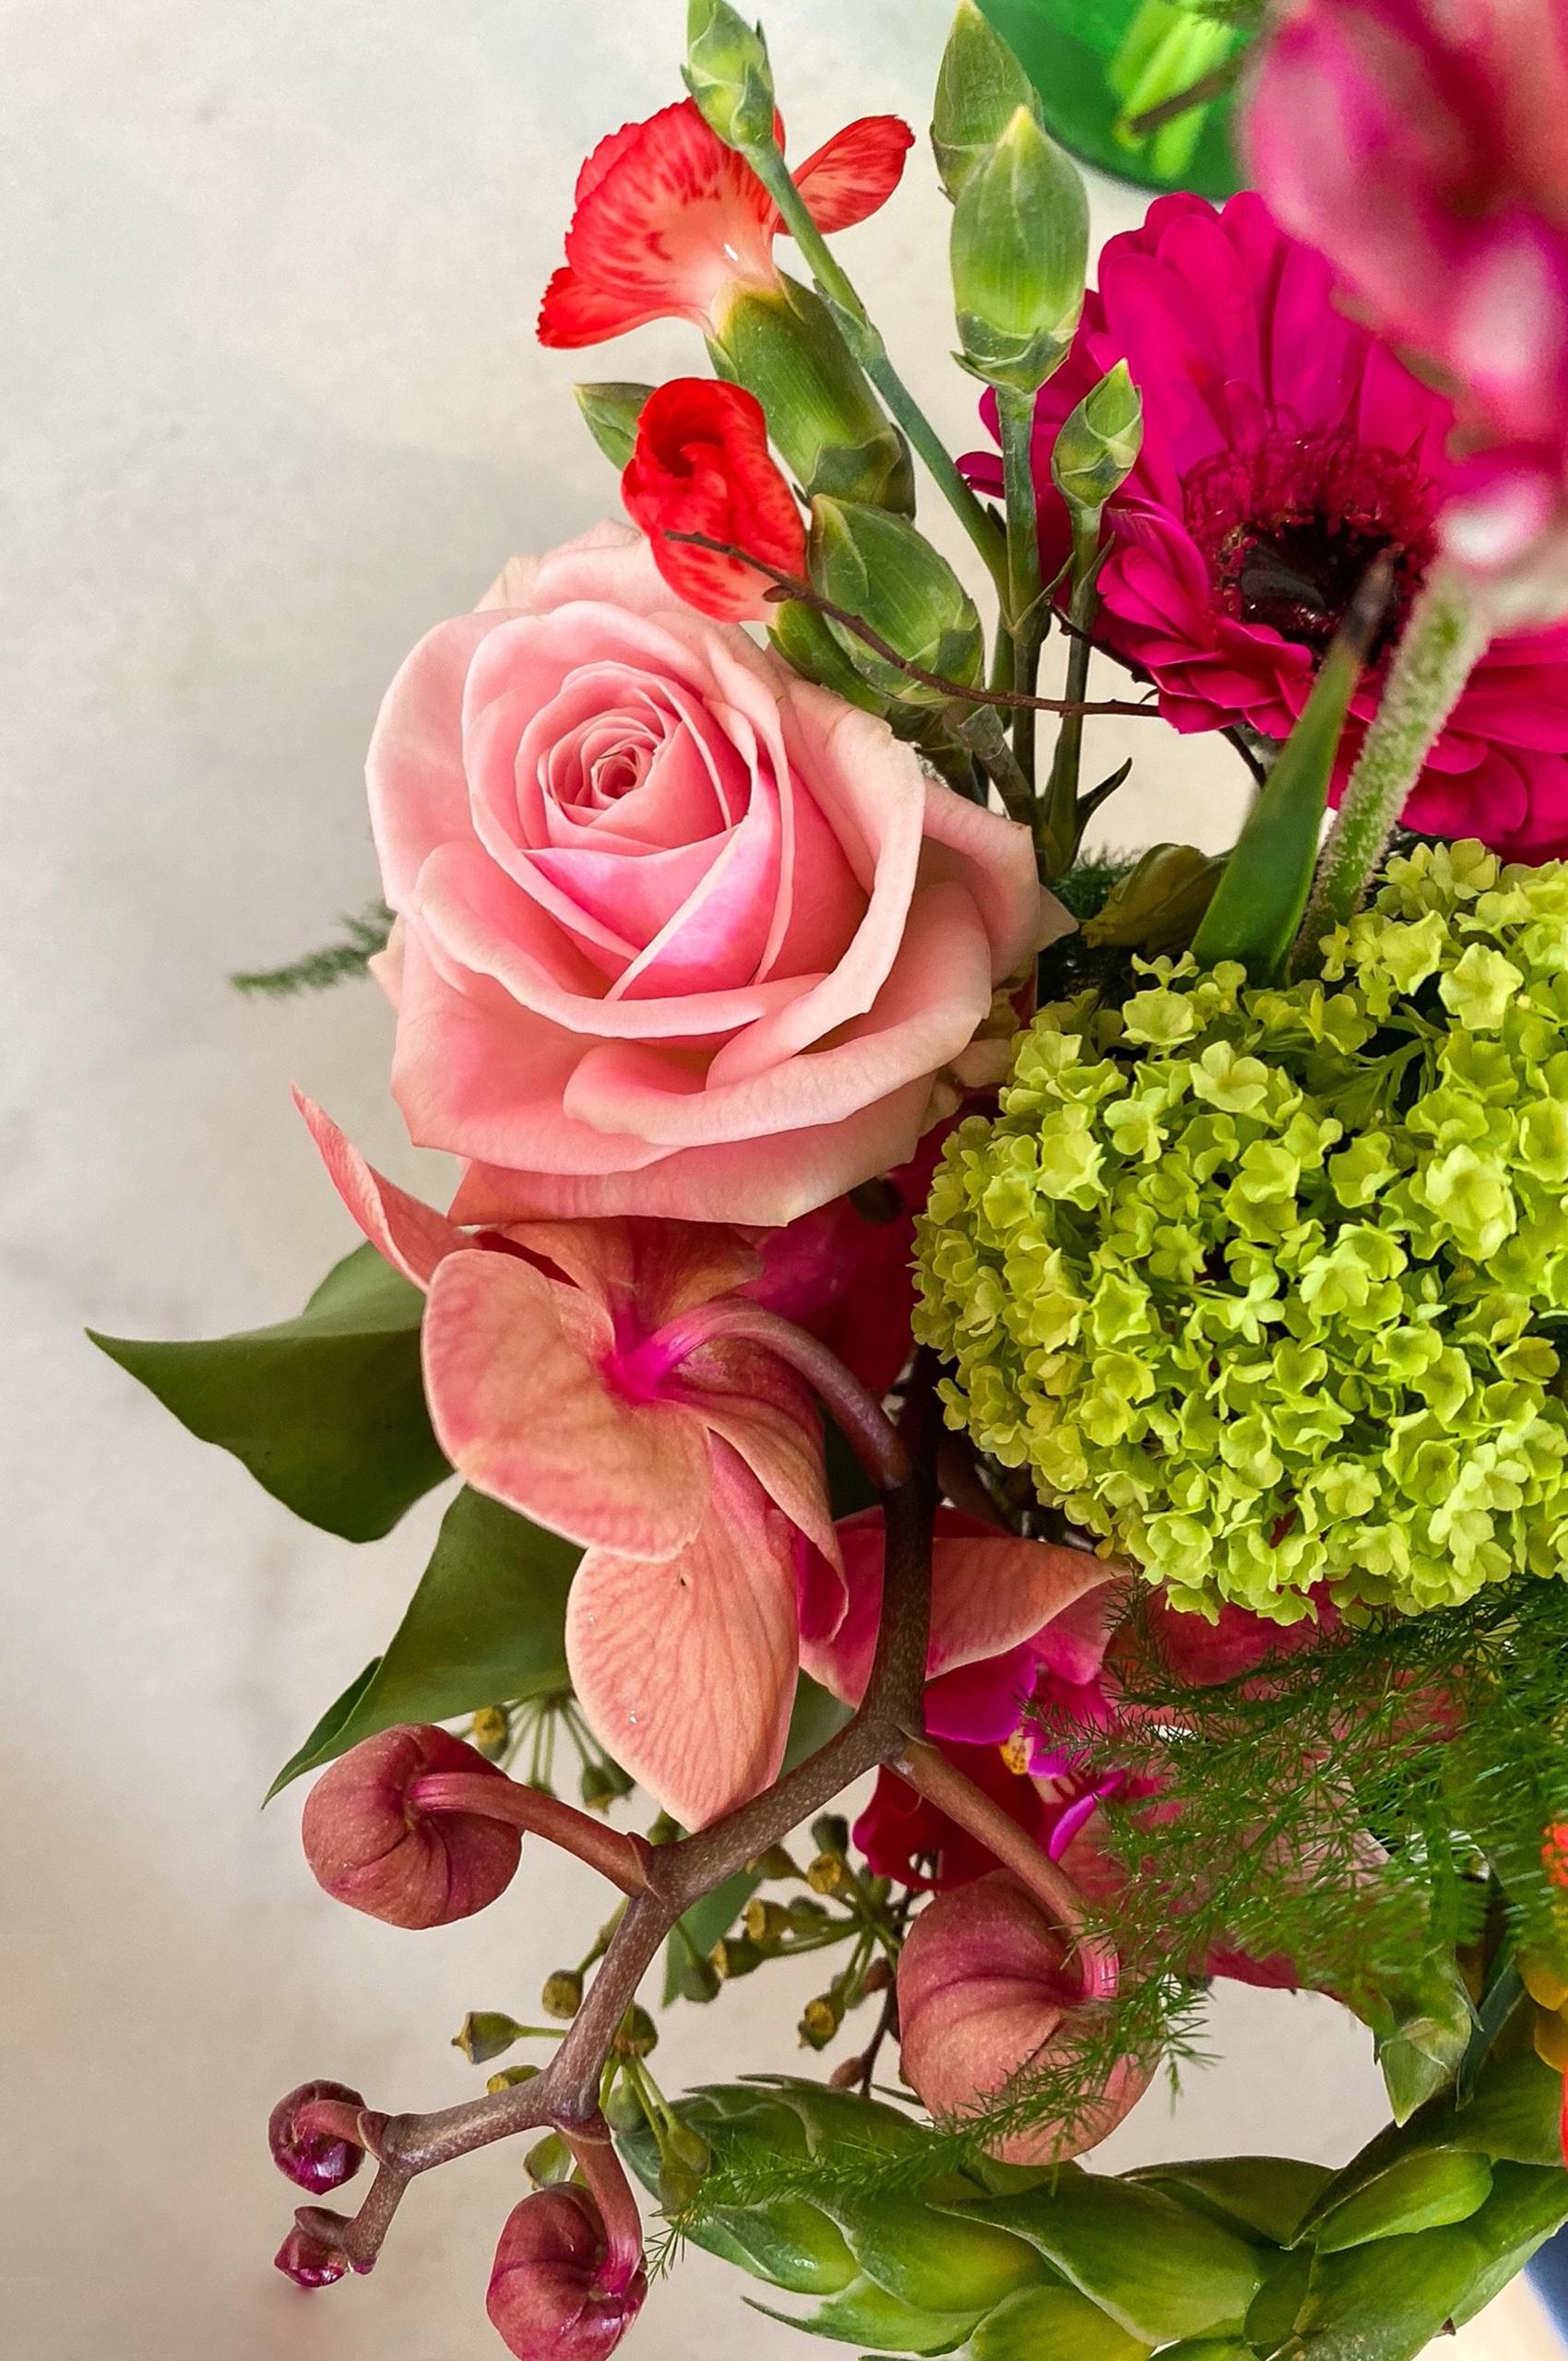 fleurtjedag brievenbusbloemen waarderingspakketjes cadeau collega